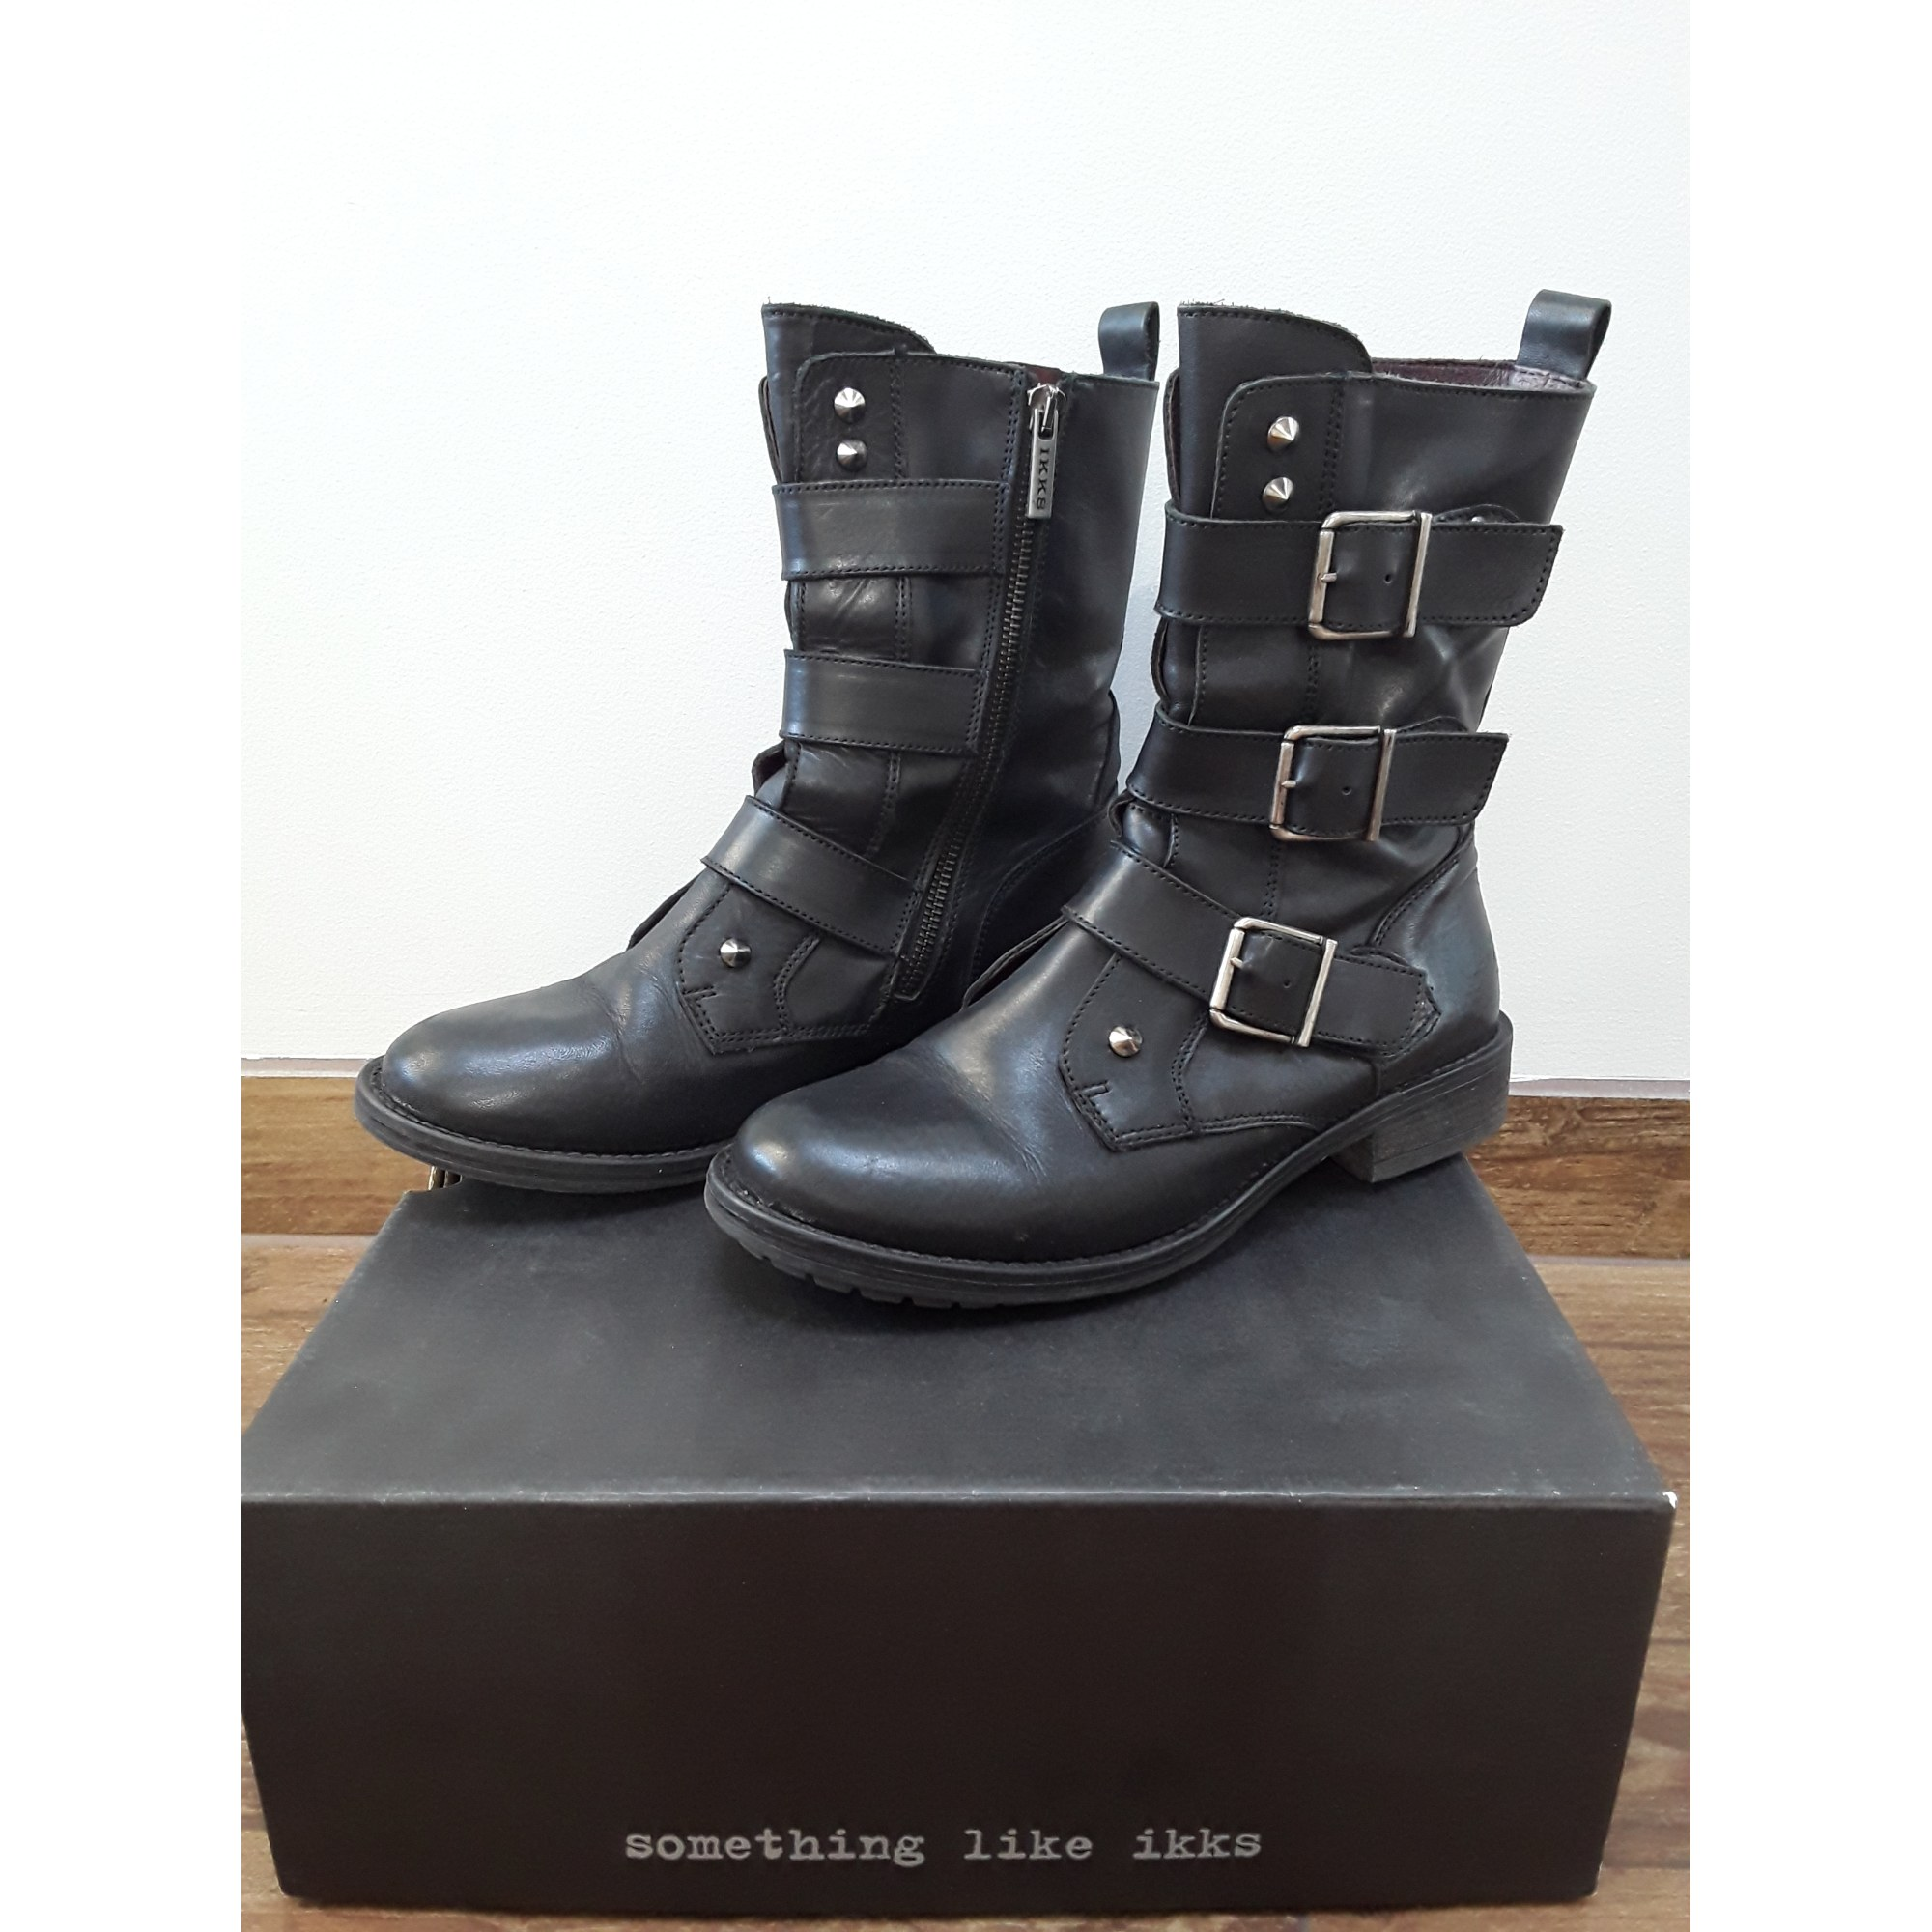 ce40bf9123e Bottines   low boots motards IKKS 39 noir vendu par Margot m. - 6521604